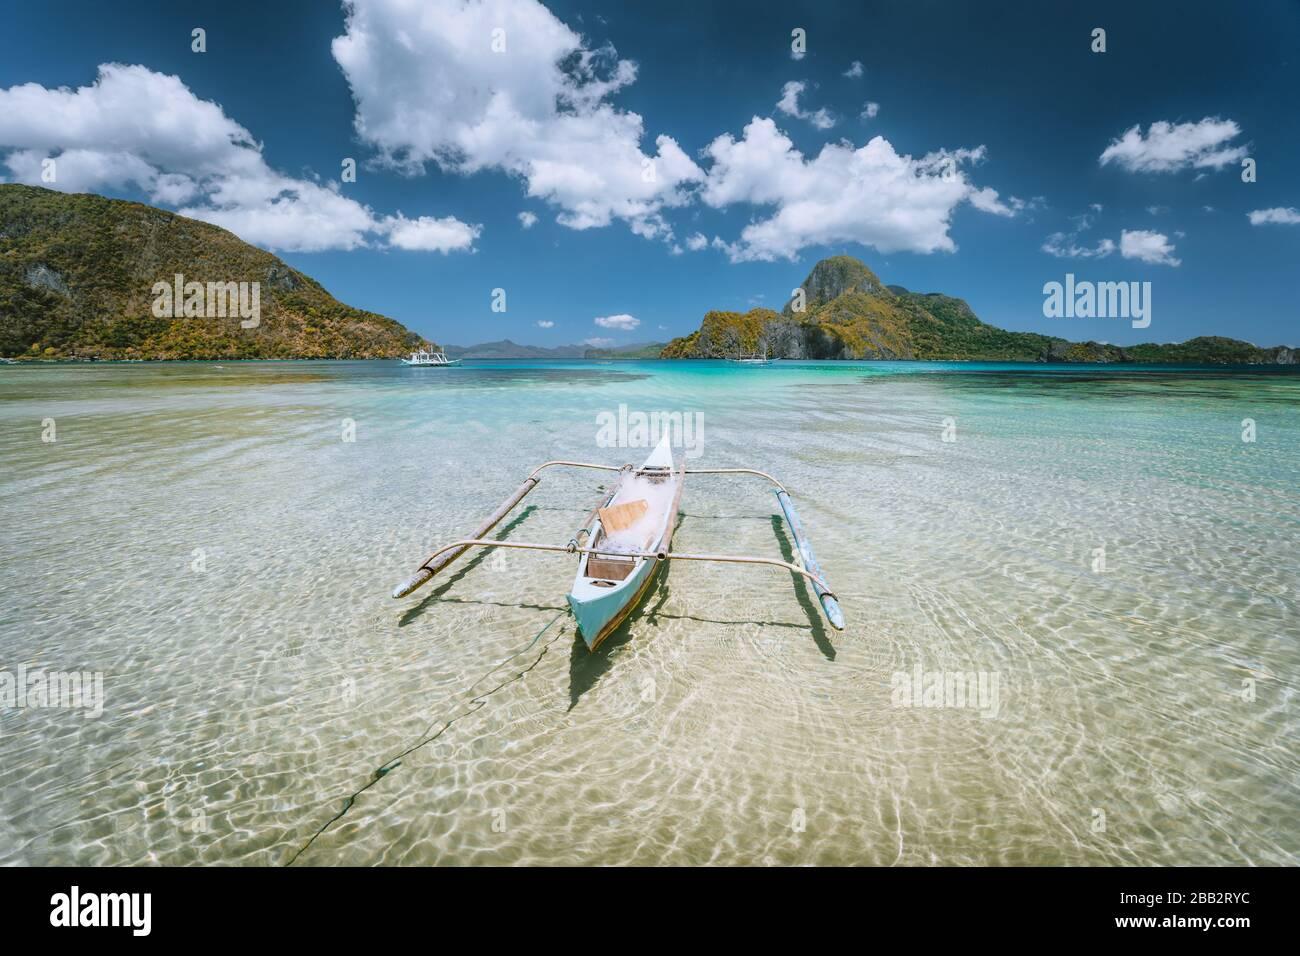 El Nido bay. Palawan island, Philippines. Lonely filippino fishing boat in shallow water lagoon at noon. Travel exotic Stock Photo